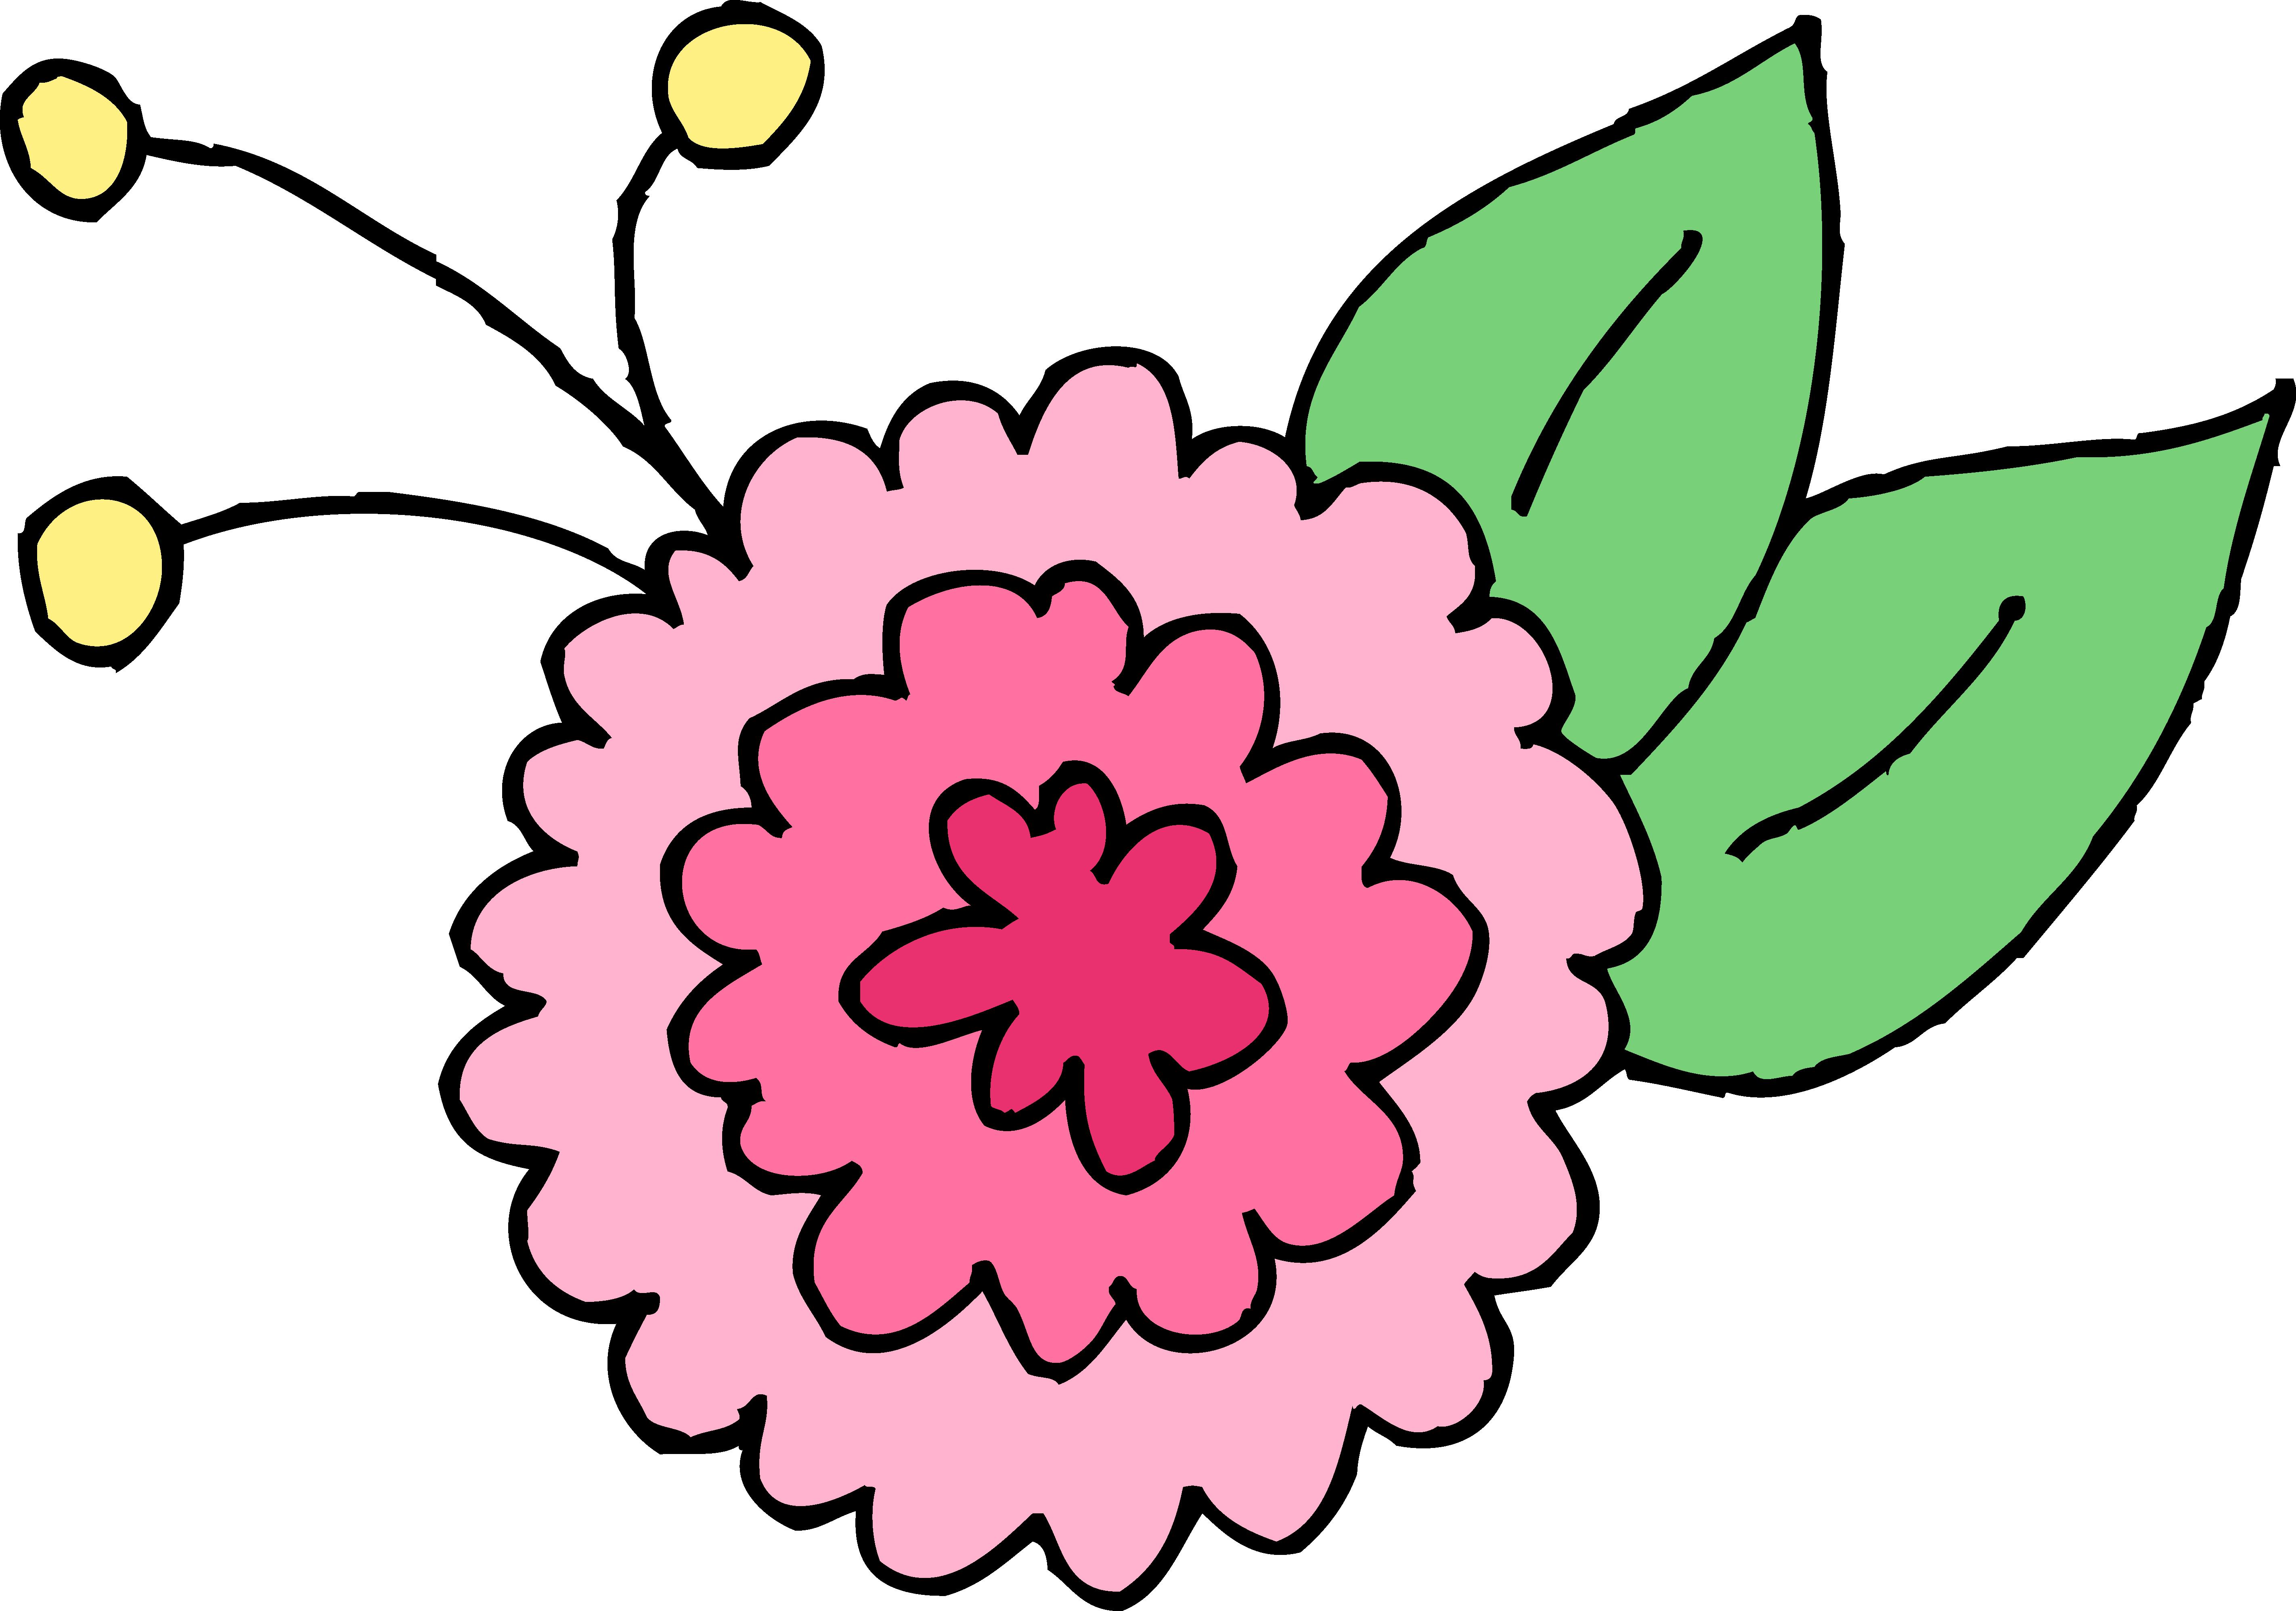 Flower cartoon images clipart free download best flower cartoon 5688x3992 cute pink chrysanthemum flower mightylinksfo